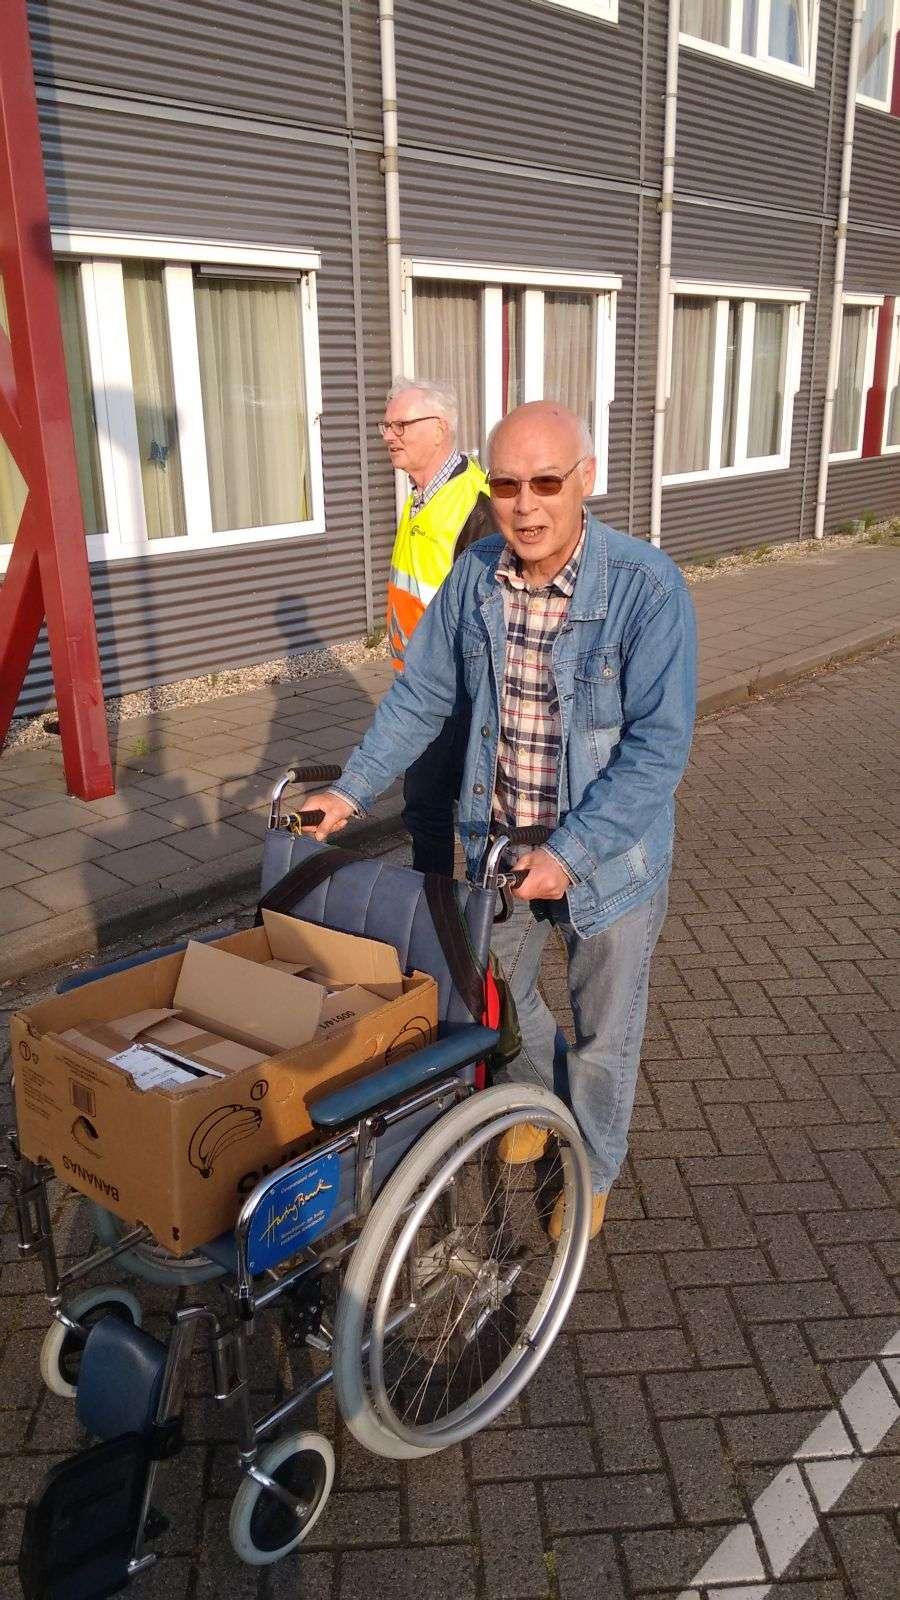 http://uvv-zoetermeer.nl/wp-content/uploads/2017/03/IMG_20160526_193648636-1.jpg